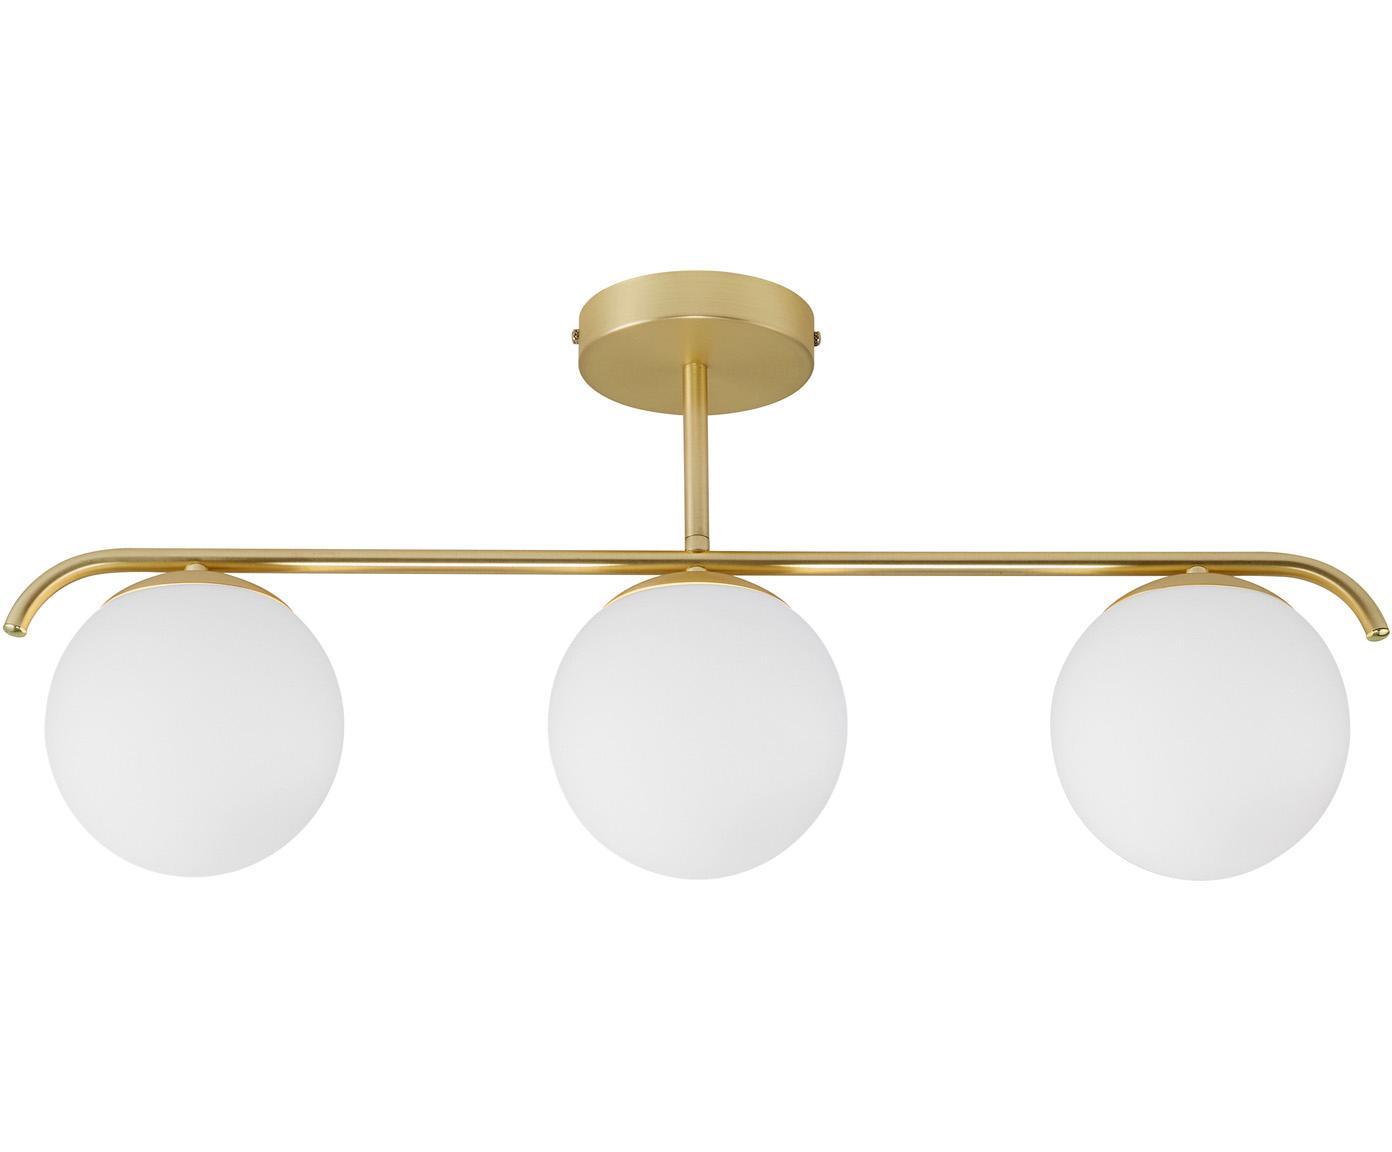 Plafondlamp Grant van opaalglas, Lampenkap: opaalglas, Baldakijn: gecoat metaal, Wit, goudkleurig, 70 x 30 cm